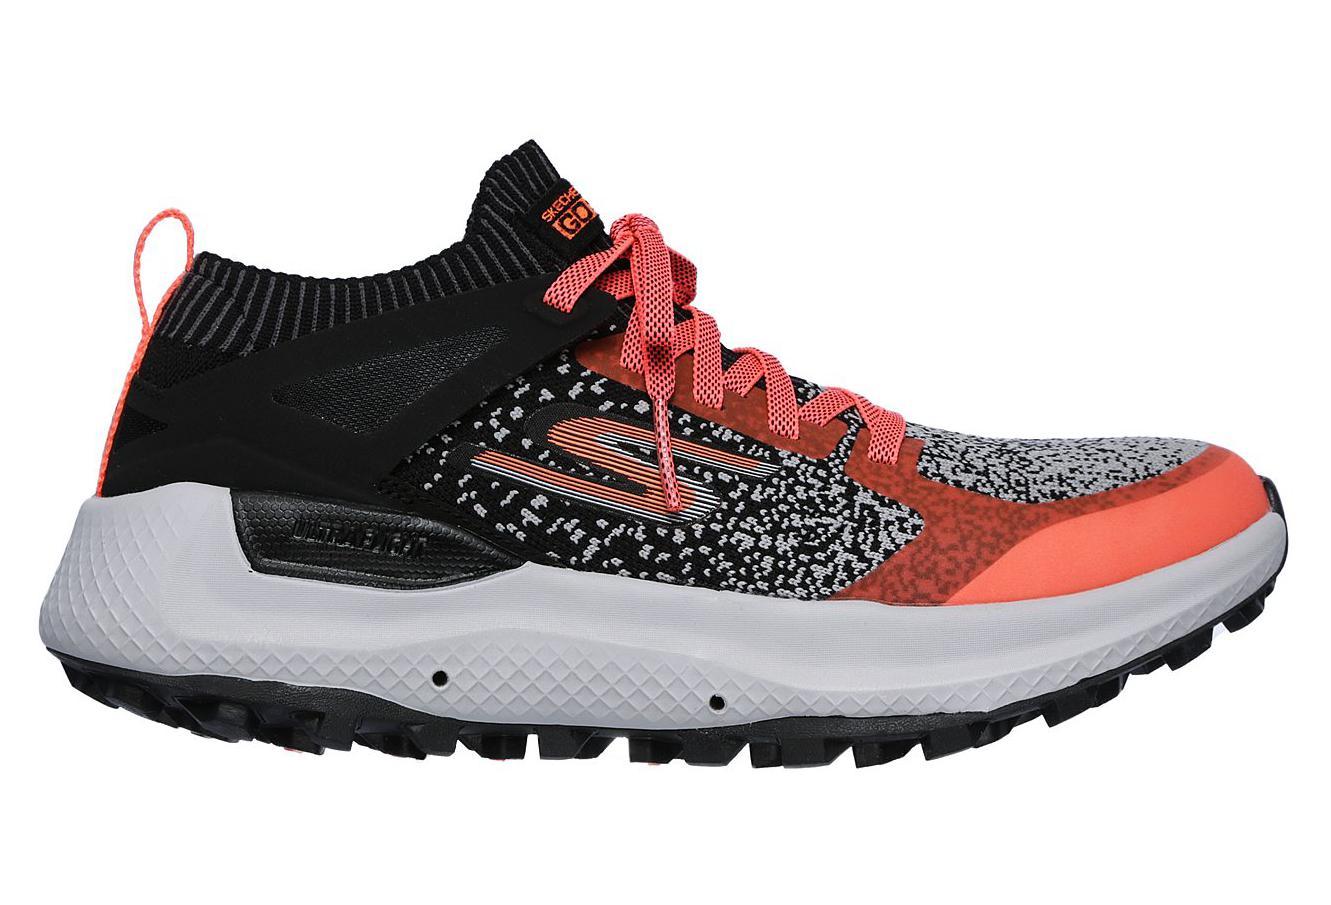 Run Max Gris 5 Skechers Ultra Go De Running Chaussures Trail 35Rj4AL